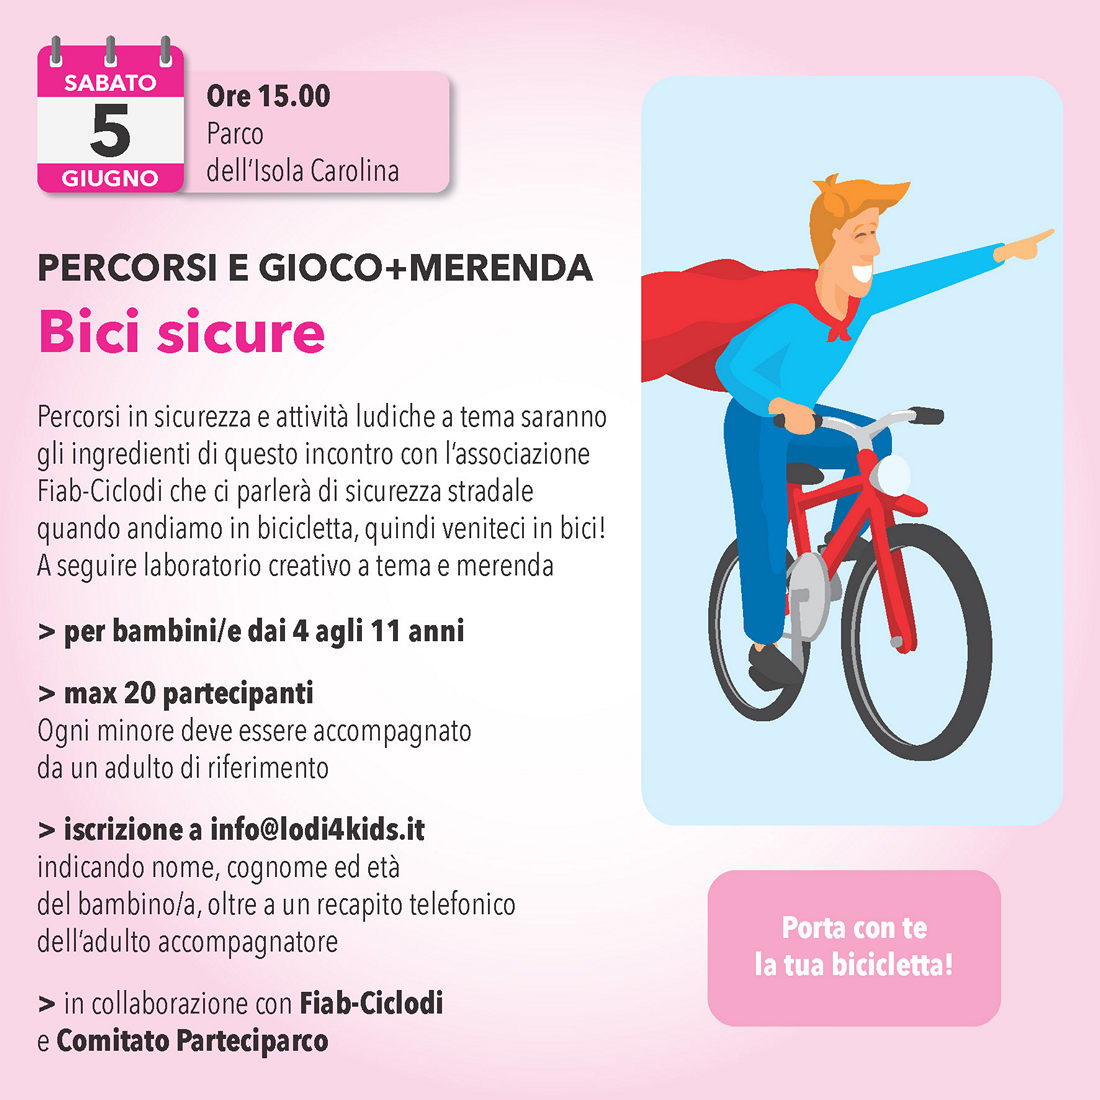 5 giugno: Bici sicure